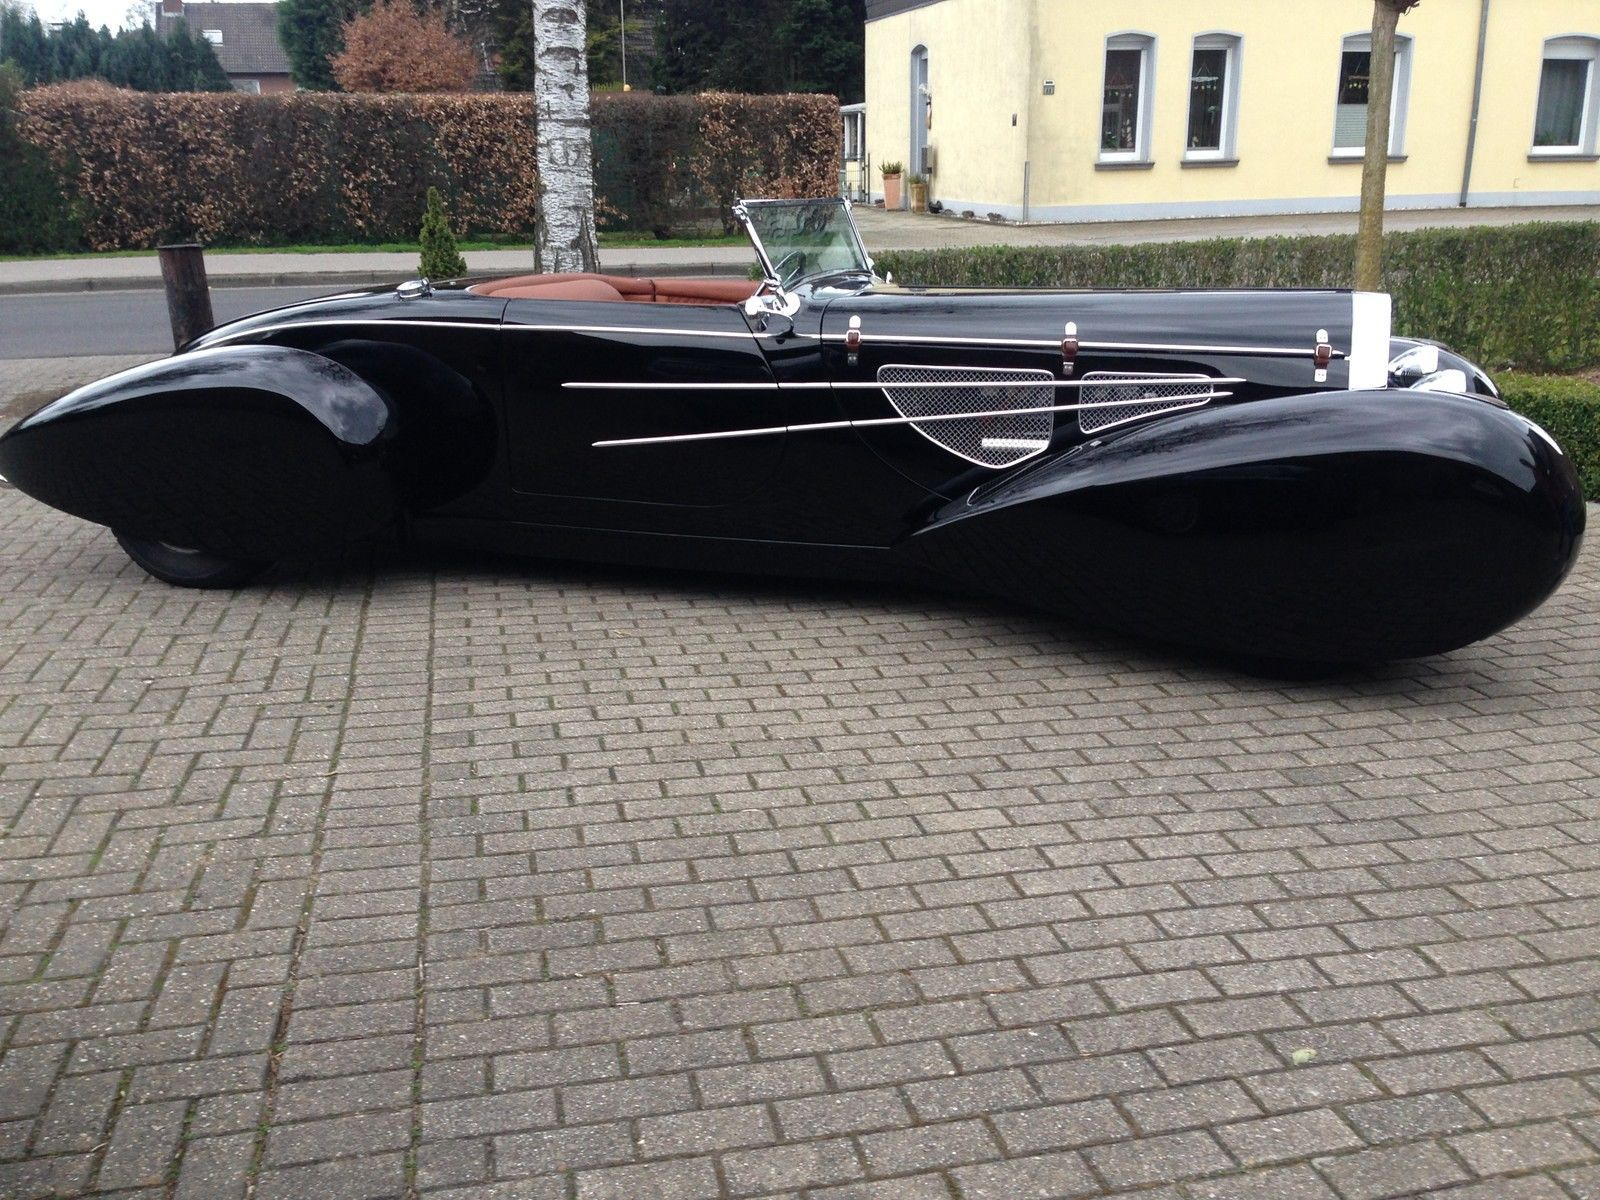 http://www.ebay.co.uk/itm/Delahaye-v8-Mercedes-Bugnotti-V8-Aluminium ...